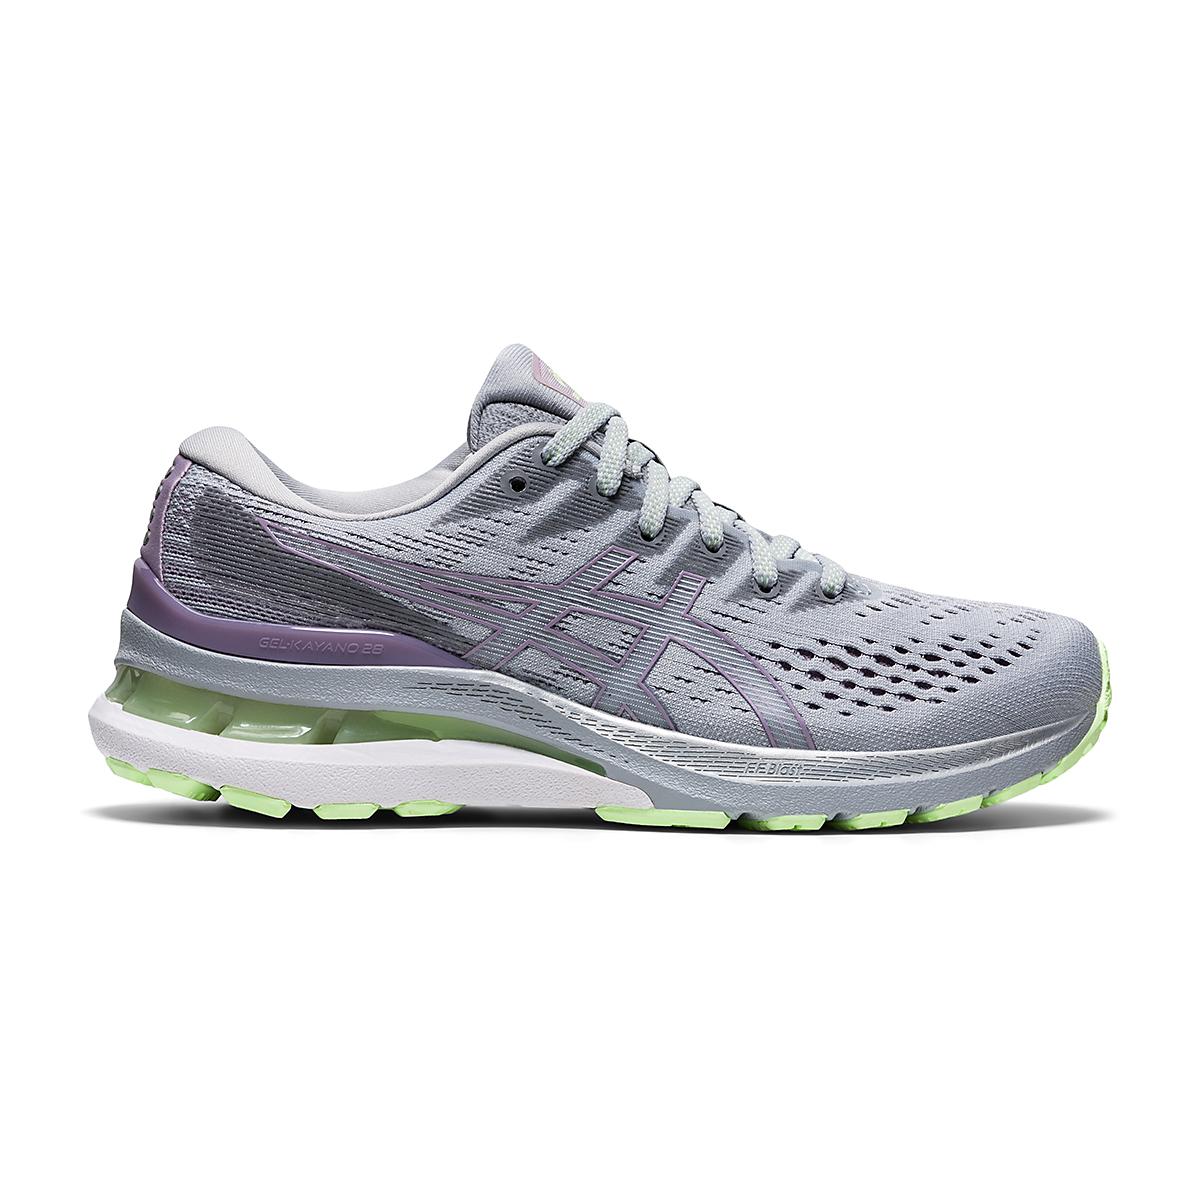 Women's Asics Gel-Kayano 28 Running Shoe - Color: Piedmont Grey/Lavender - Size: 5 - Width: Regular, Piedmont Grey/Lavender, large, image 1